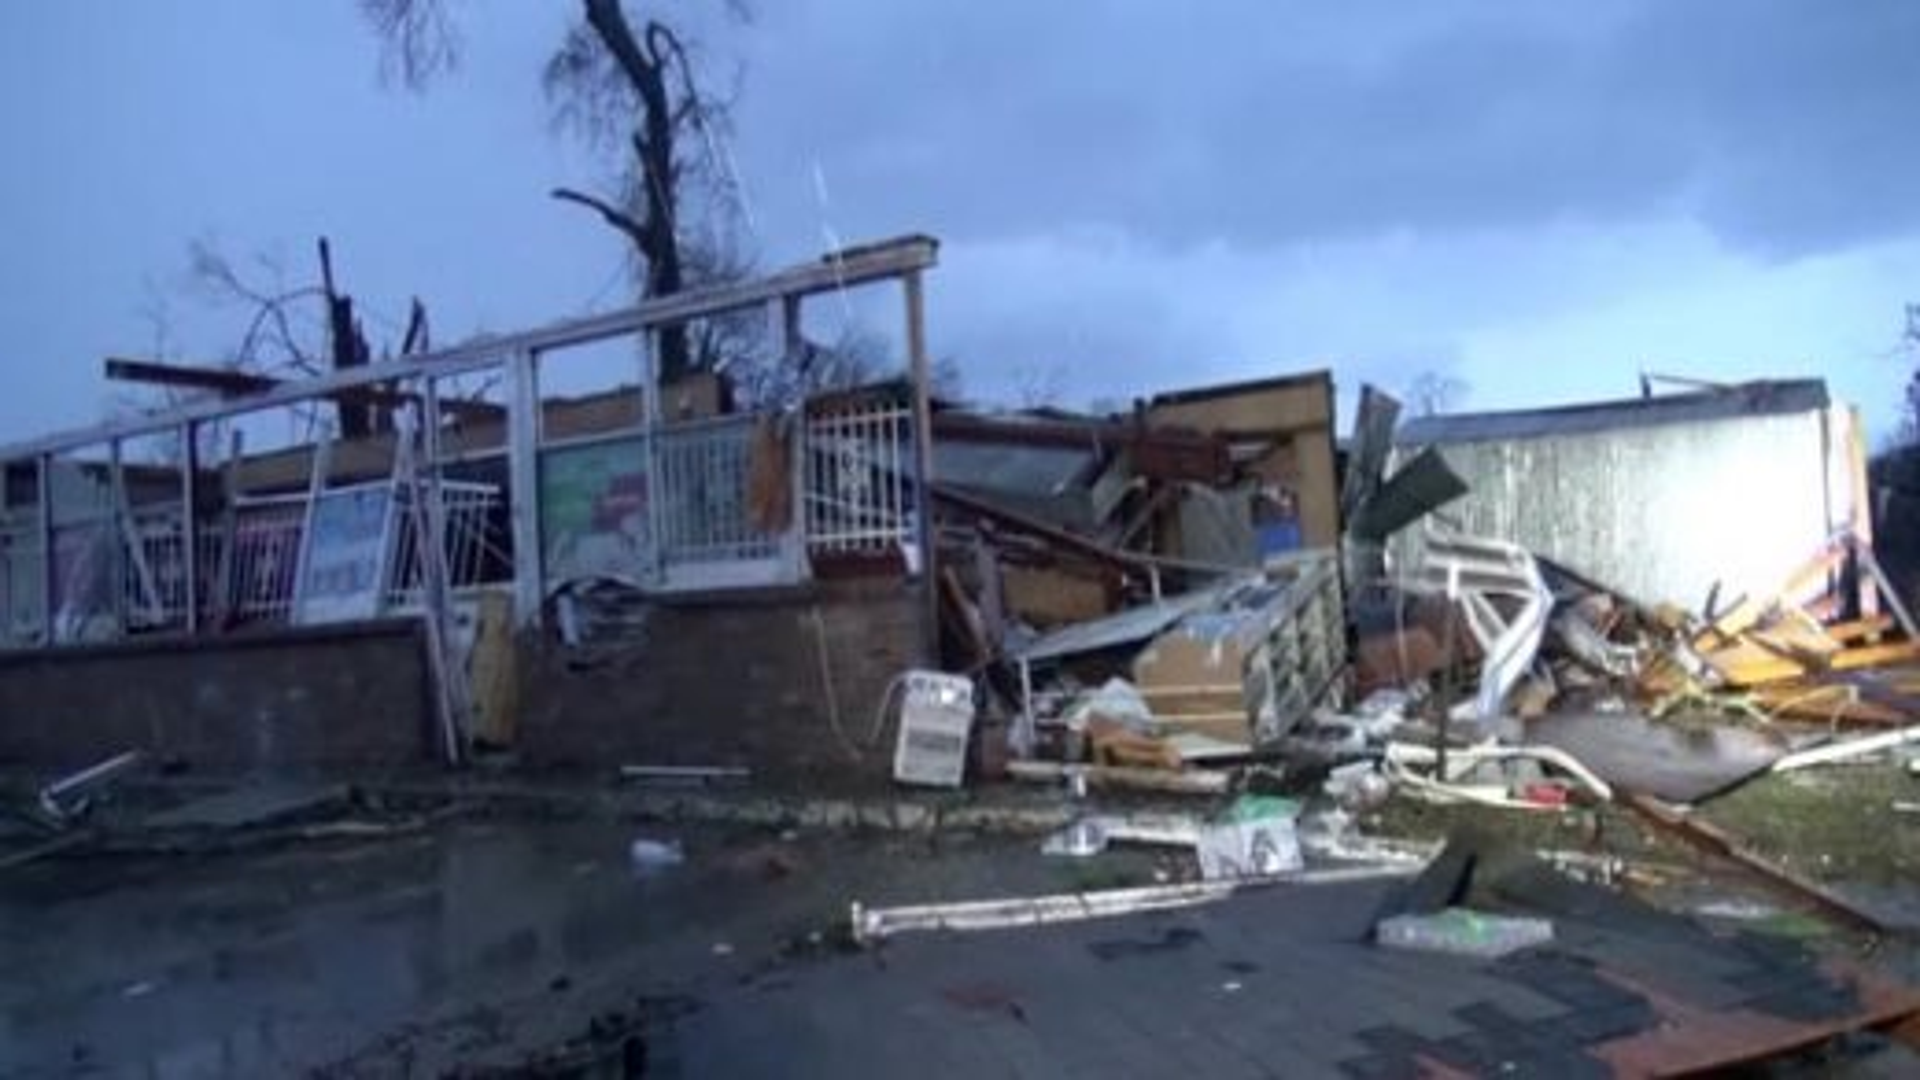 طوفان میسیسیپی | تگ